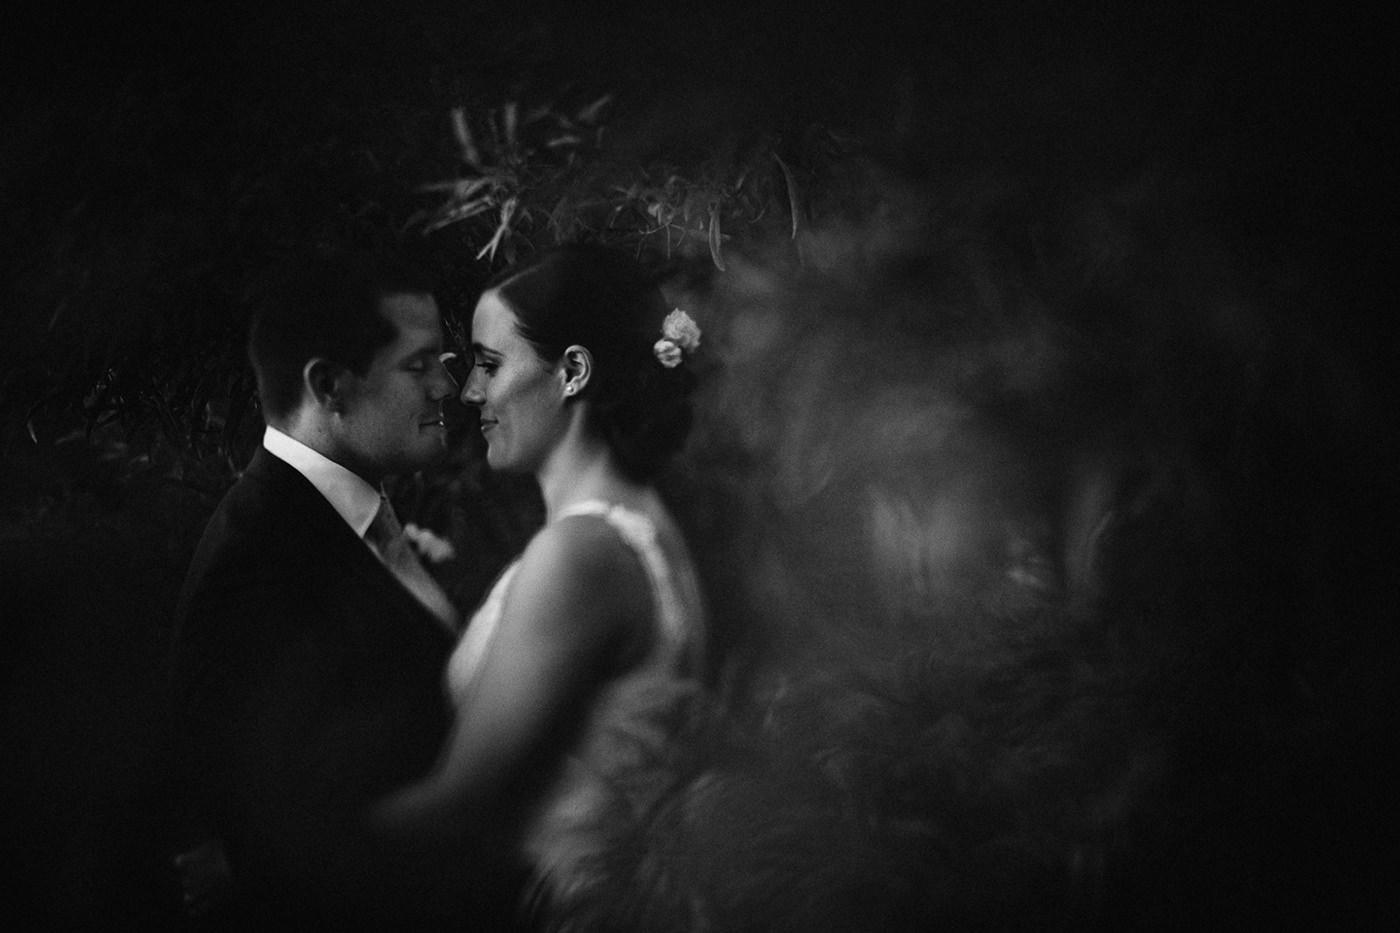 wedding_photographer_nz-00018.jpg